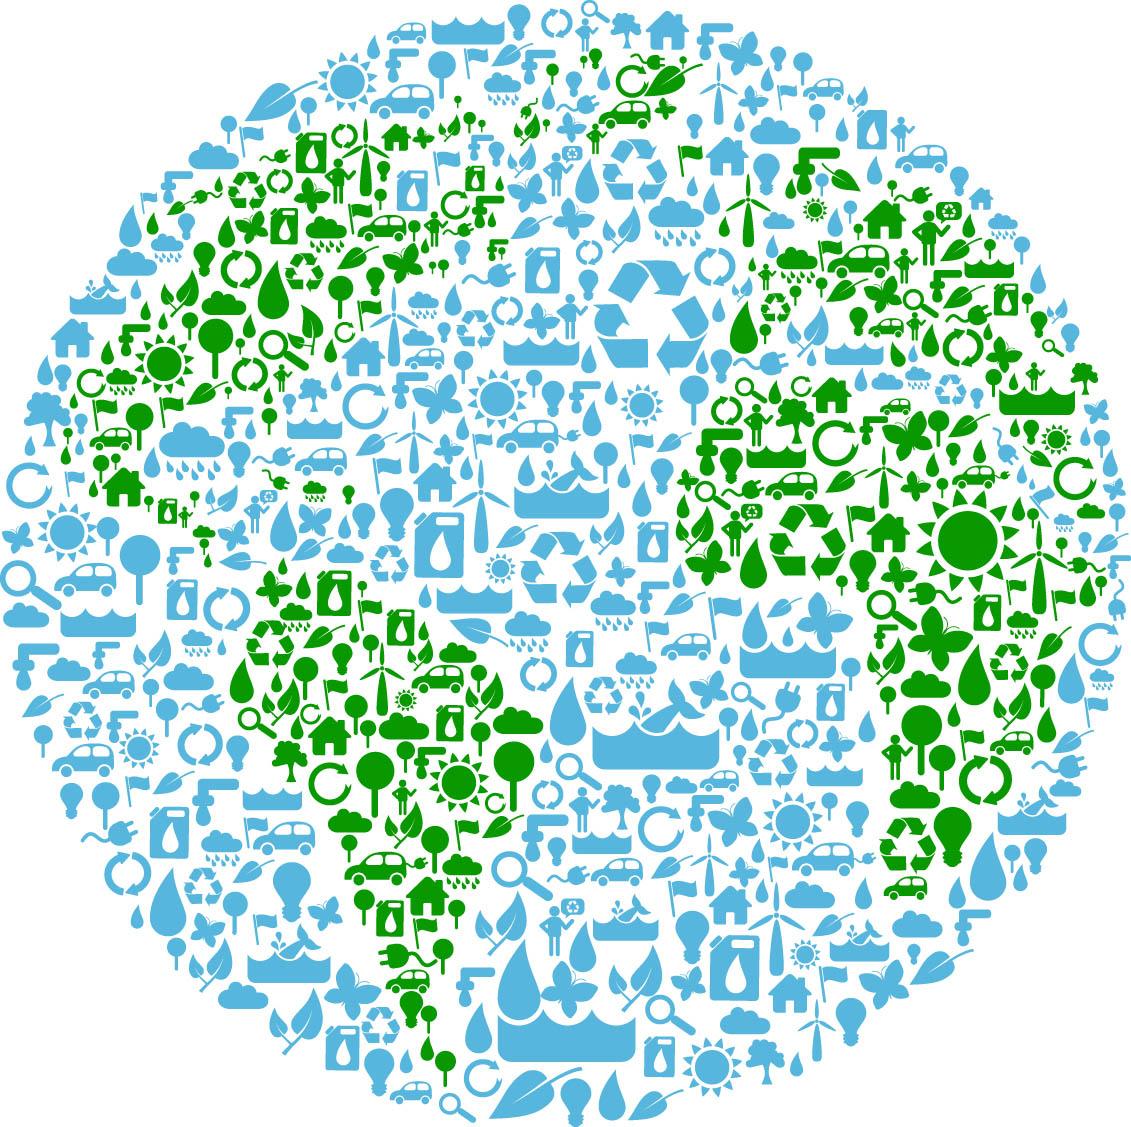 973 Third Avenue Earth Day